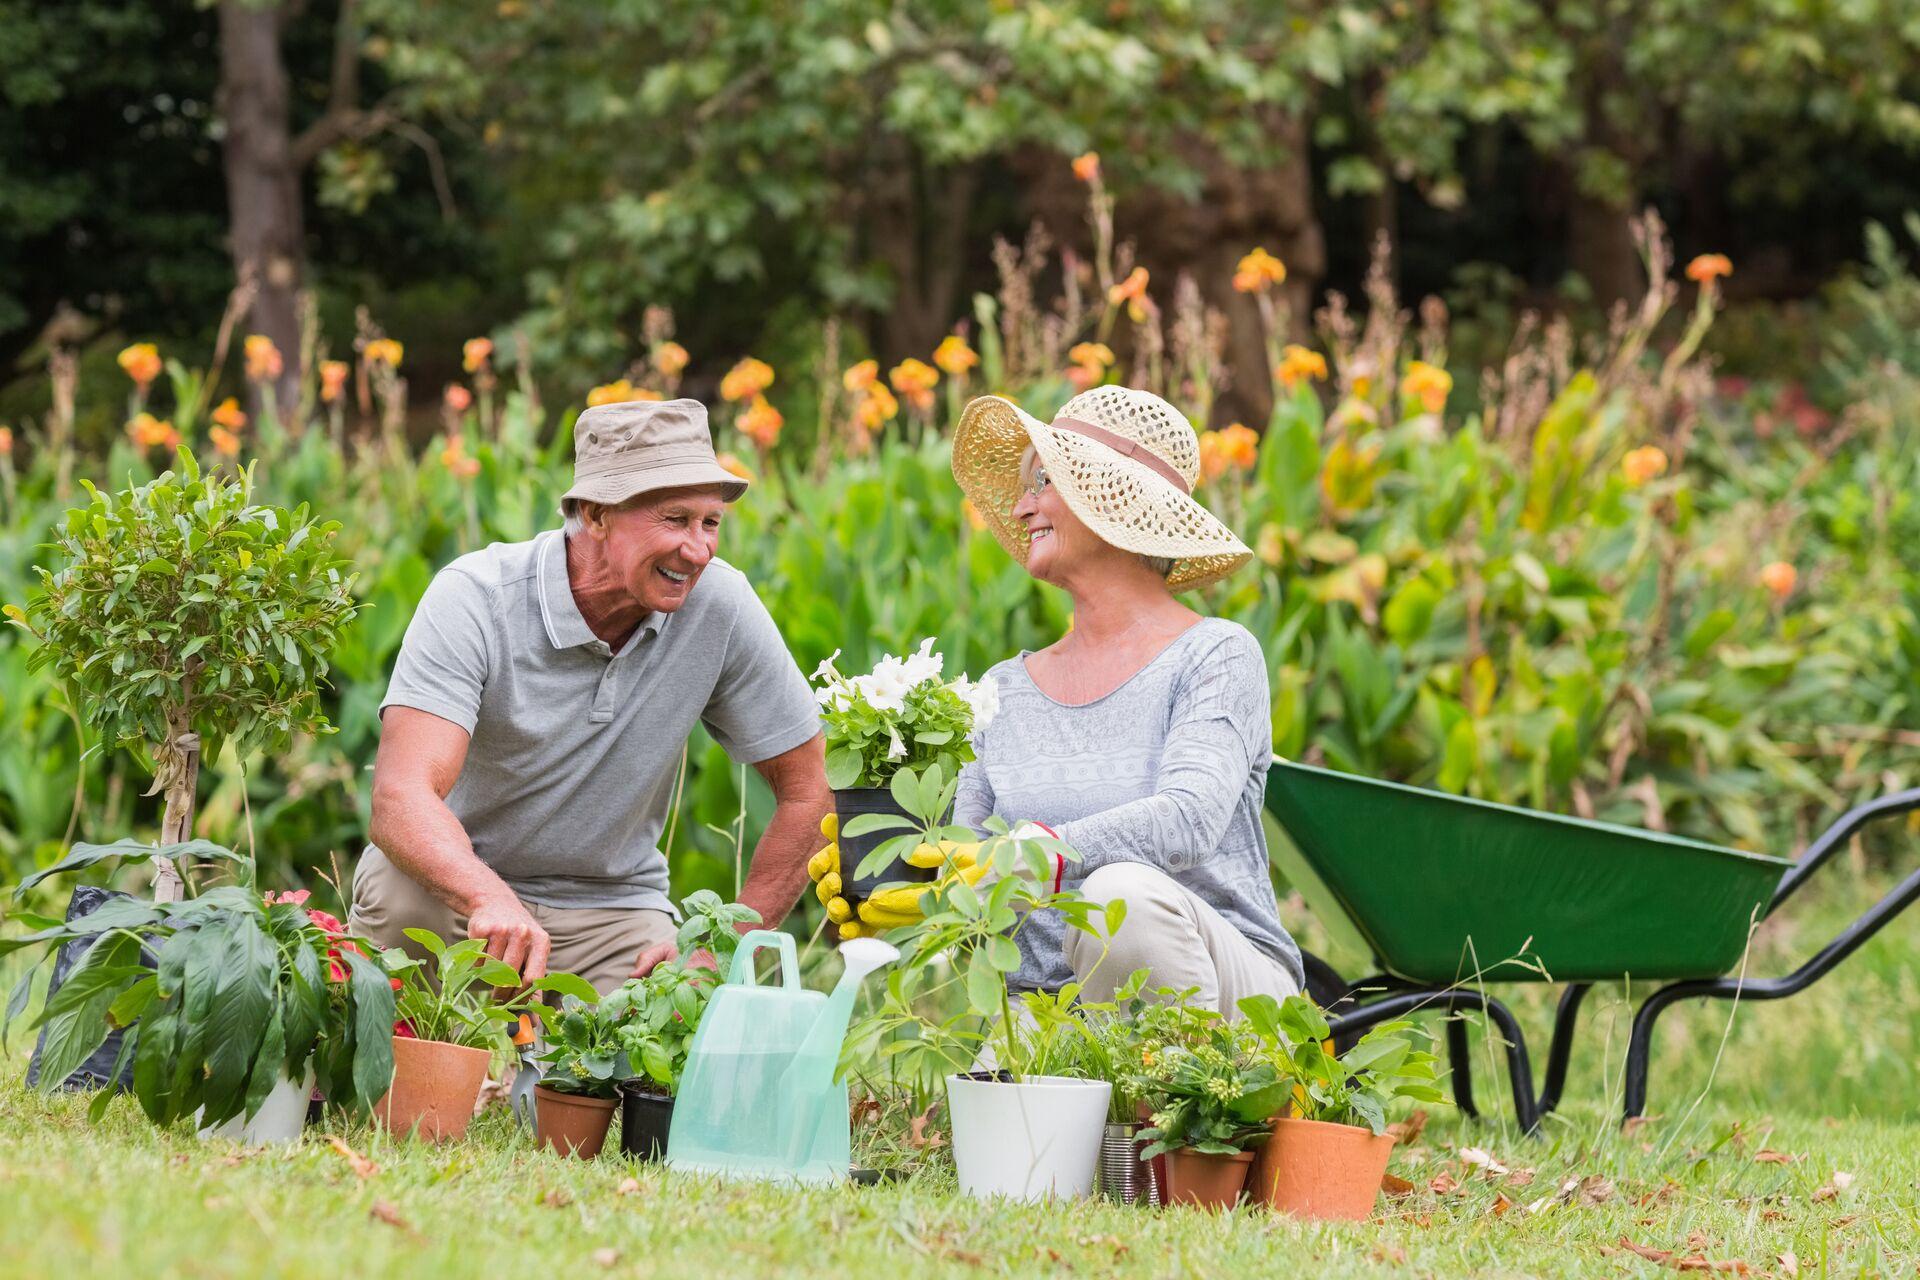 Two seniors gardening